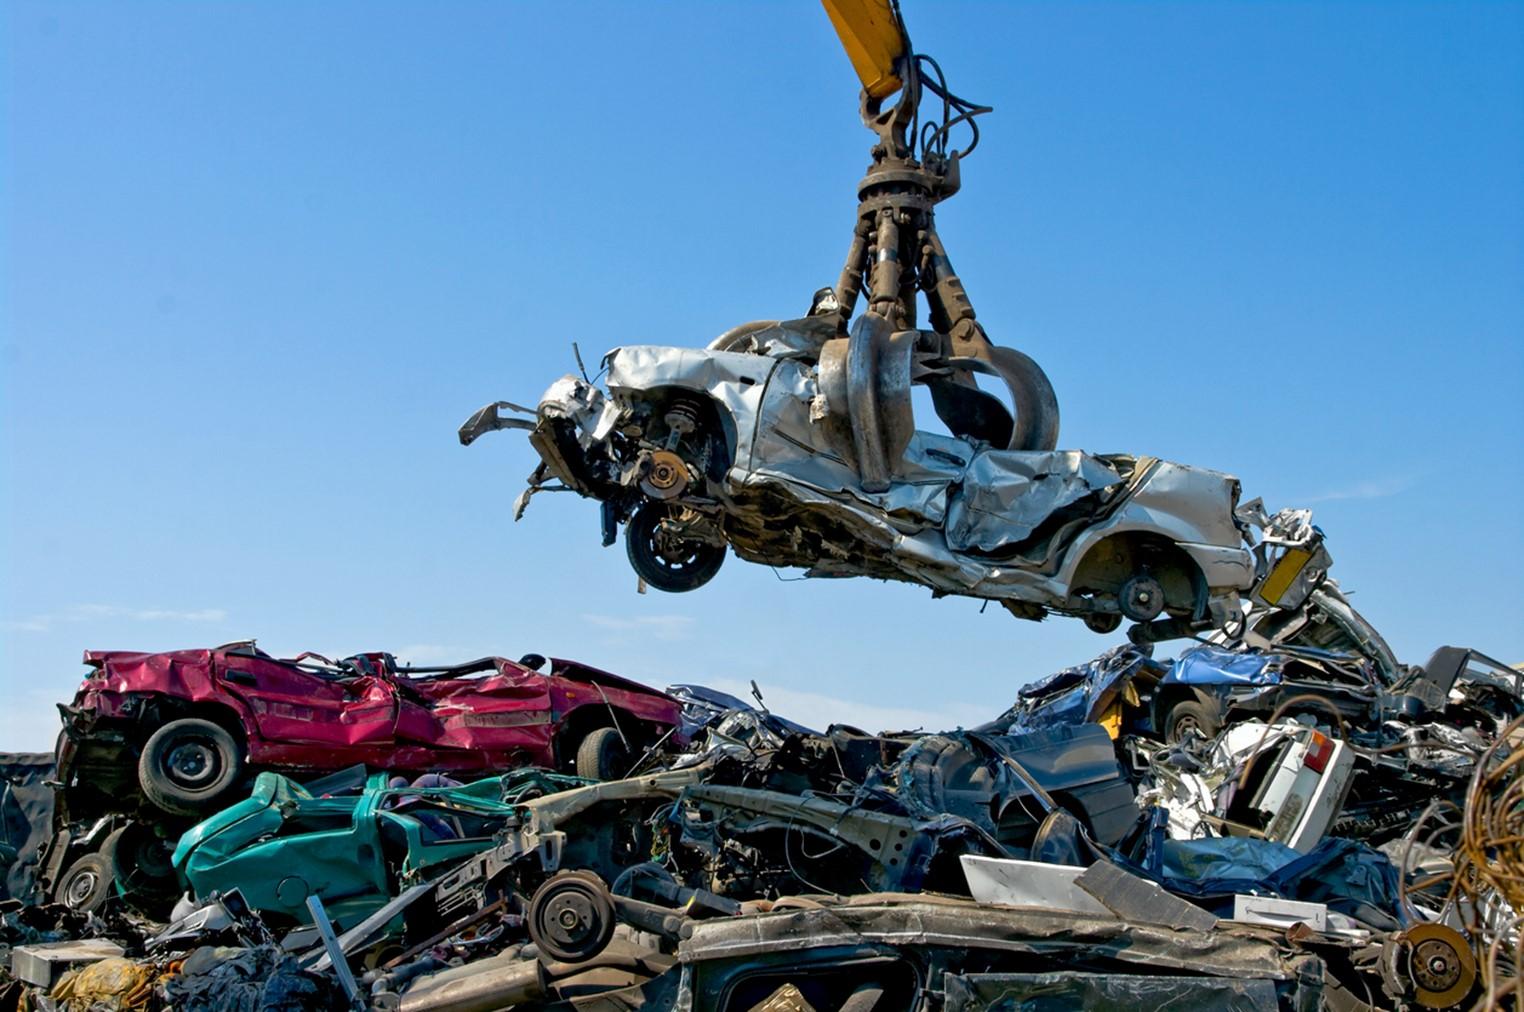 scrap metals in a place